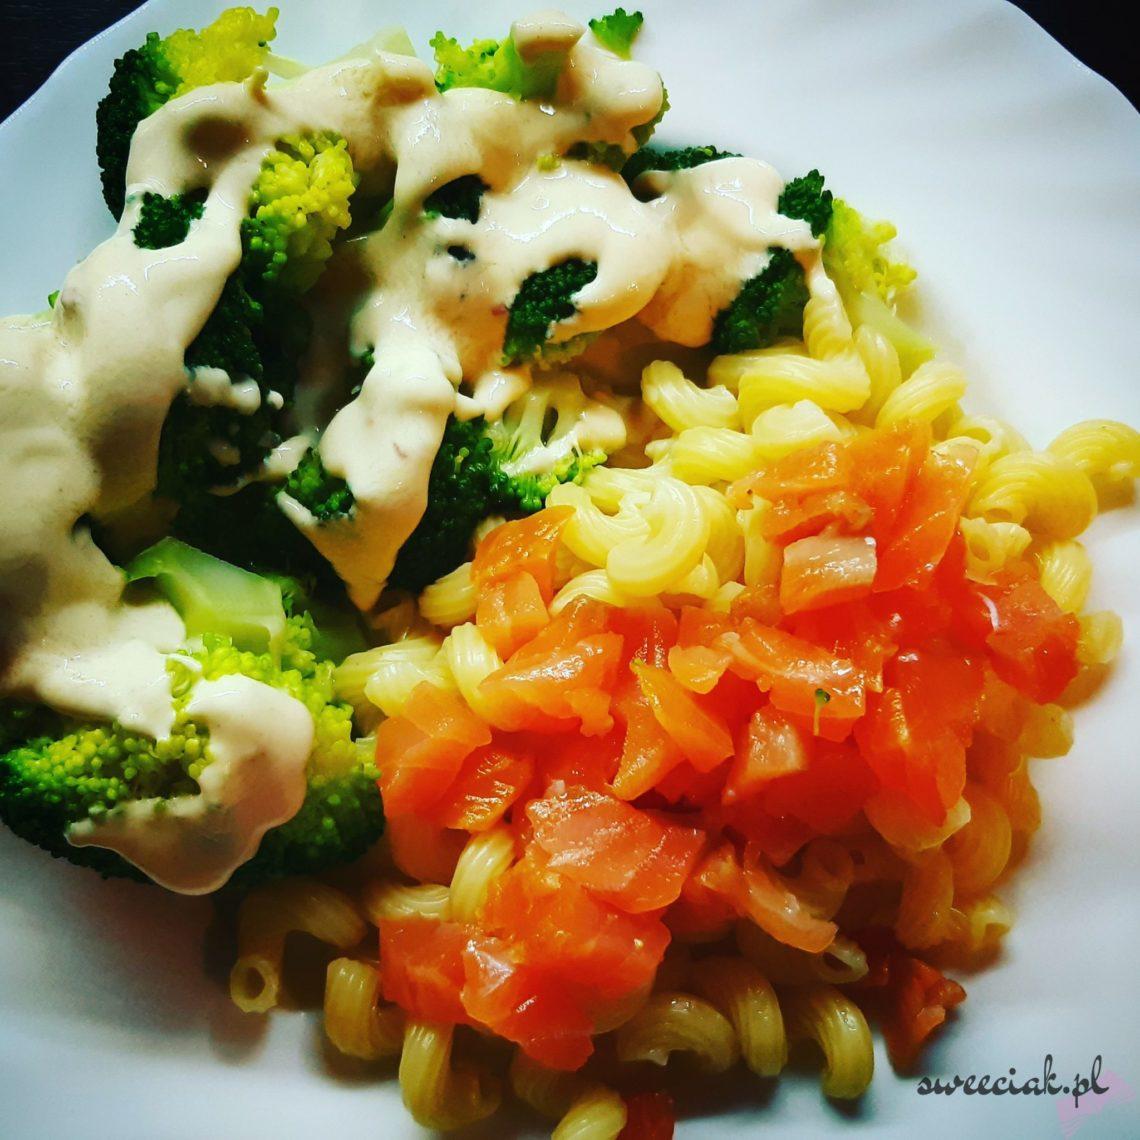 Brokuły, makaron i łosoś